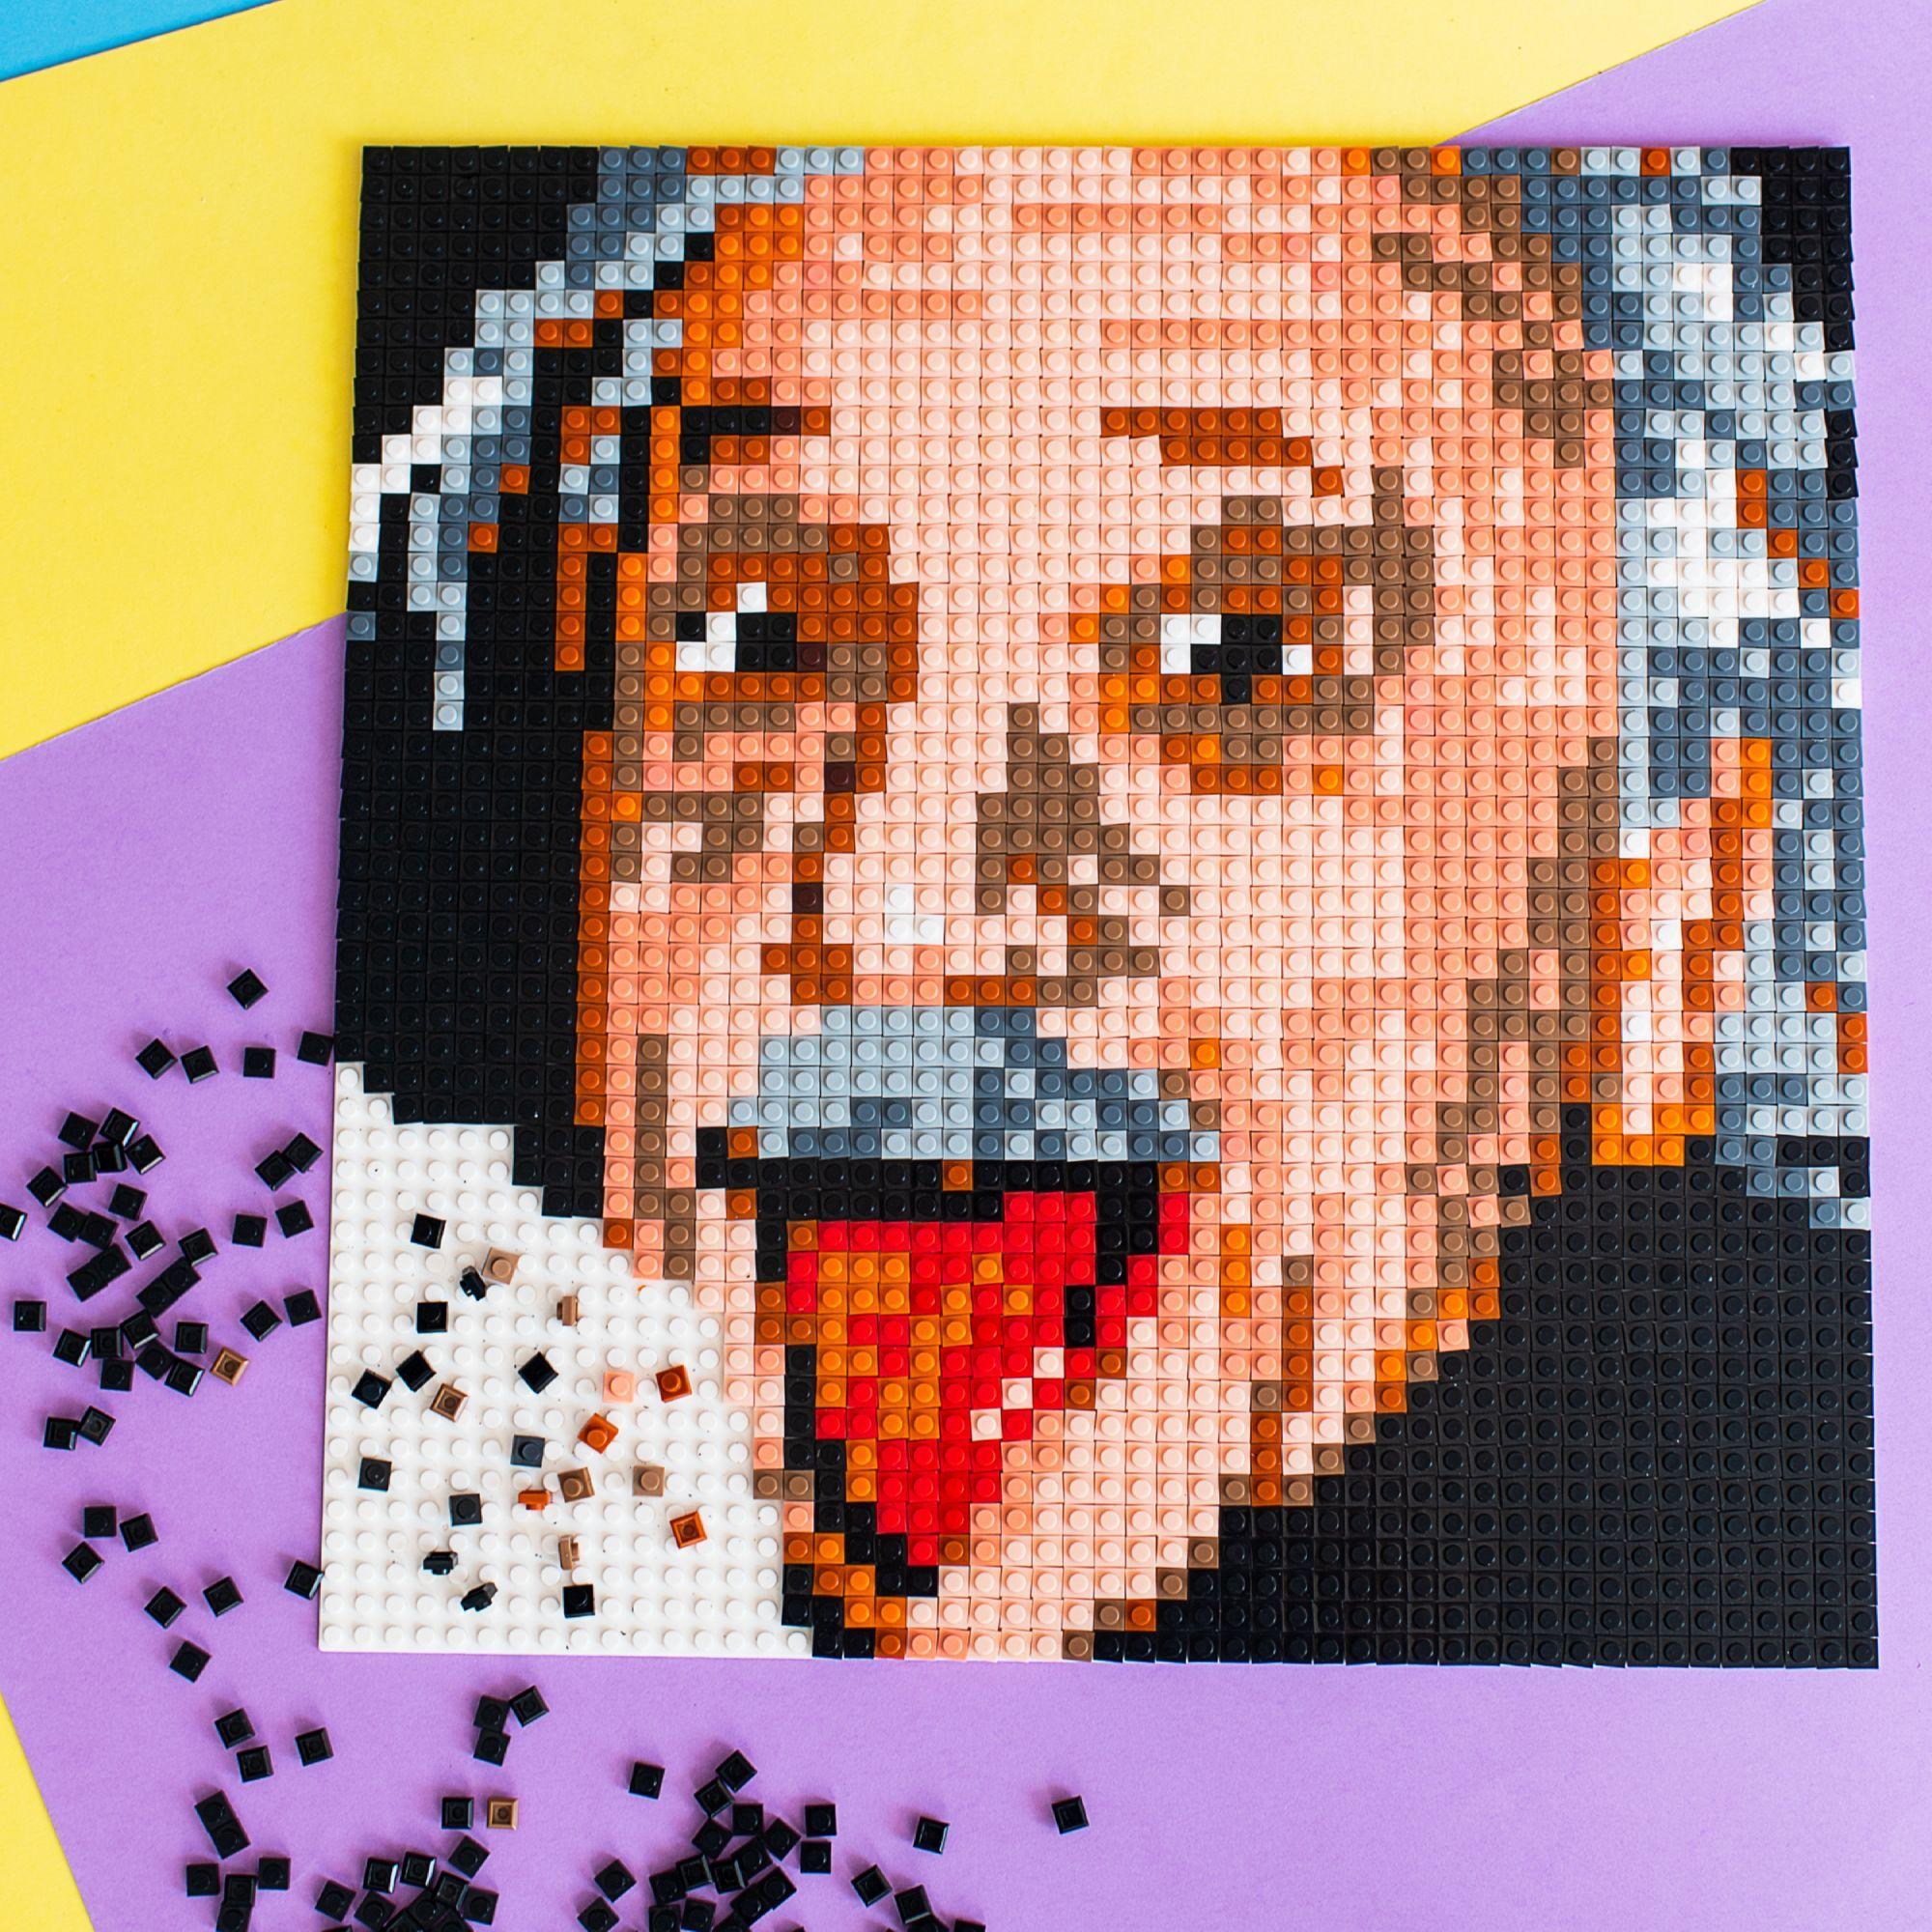 Lego Like Mosaic Portraits And Any Pictures By Selfiemosaic Albert Einstein Lego Diy Crafts Mosaic Diy Mosaic Portrait